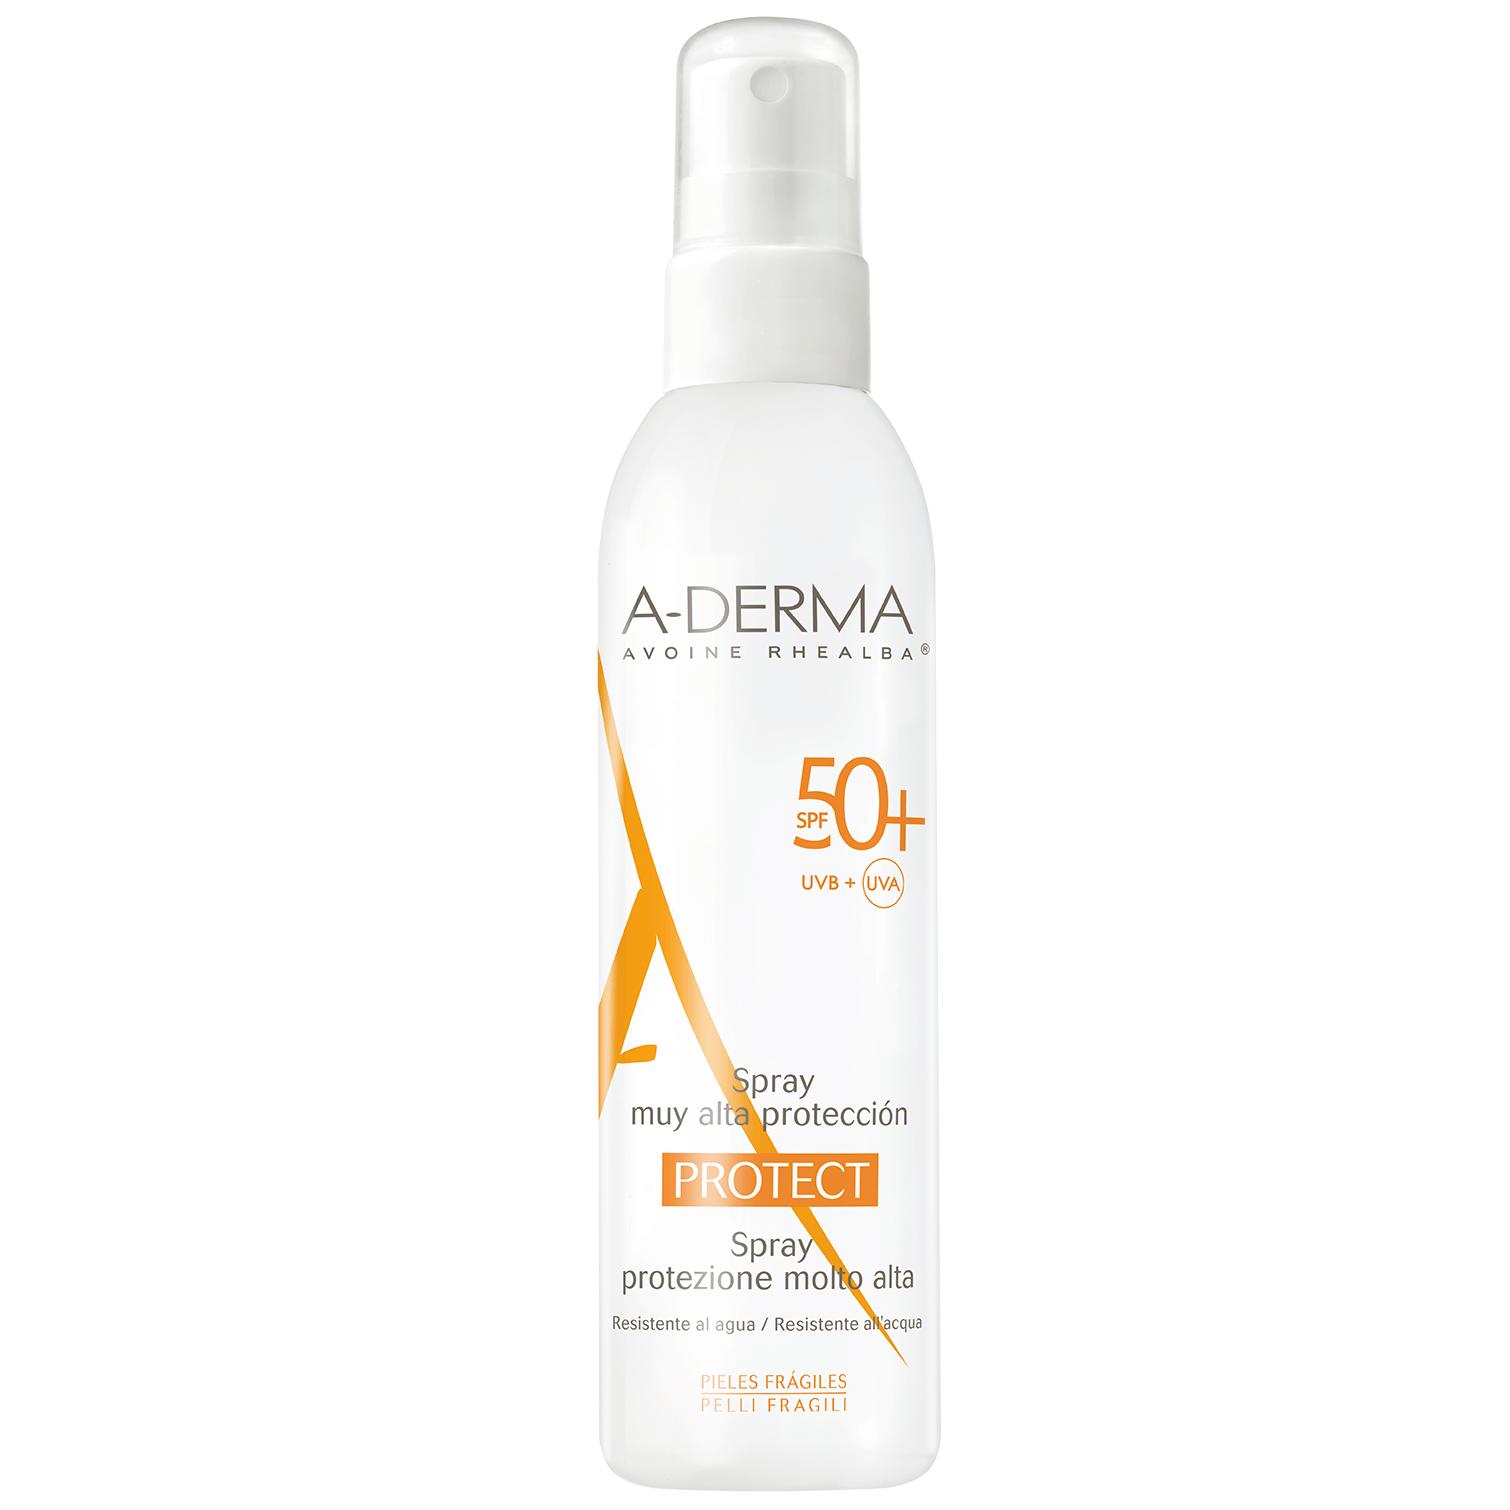 A-Derma Protect Spray Spf50+ Αντηλιακό Σπρέι Πολύ Υψηλής Προστασίας 200ml